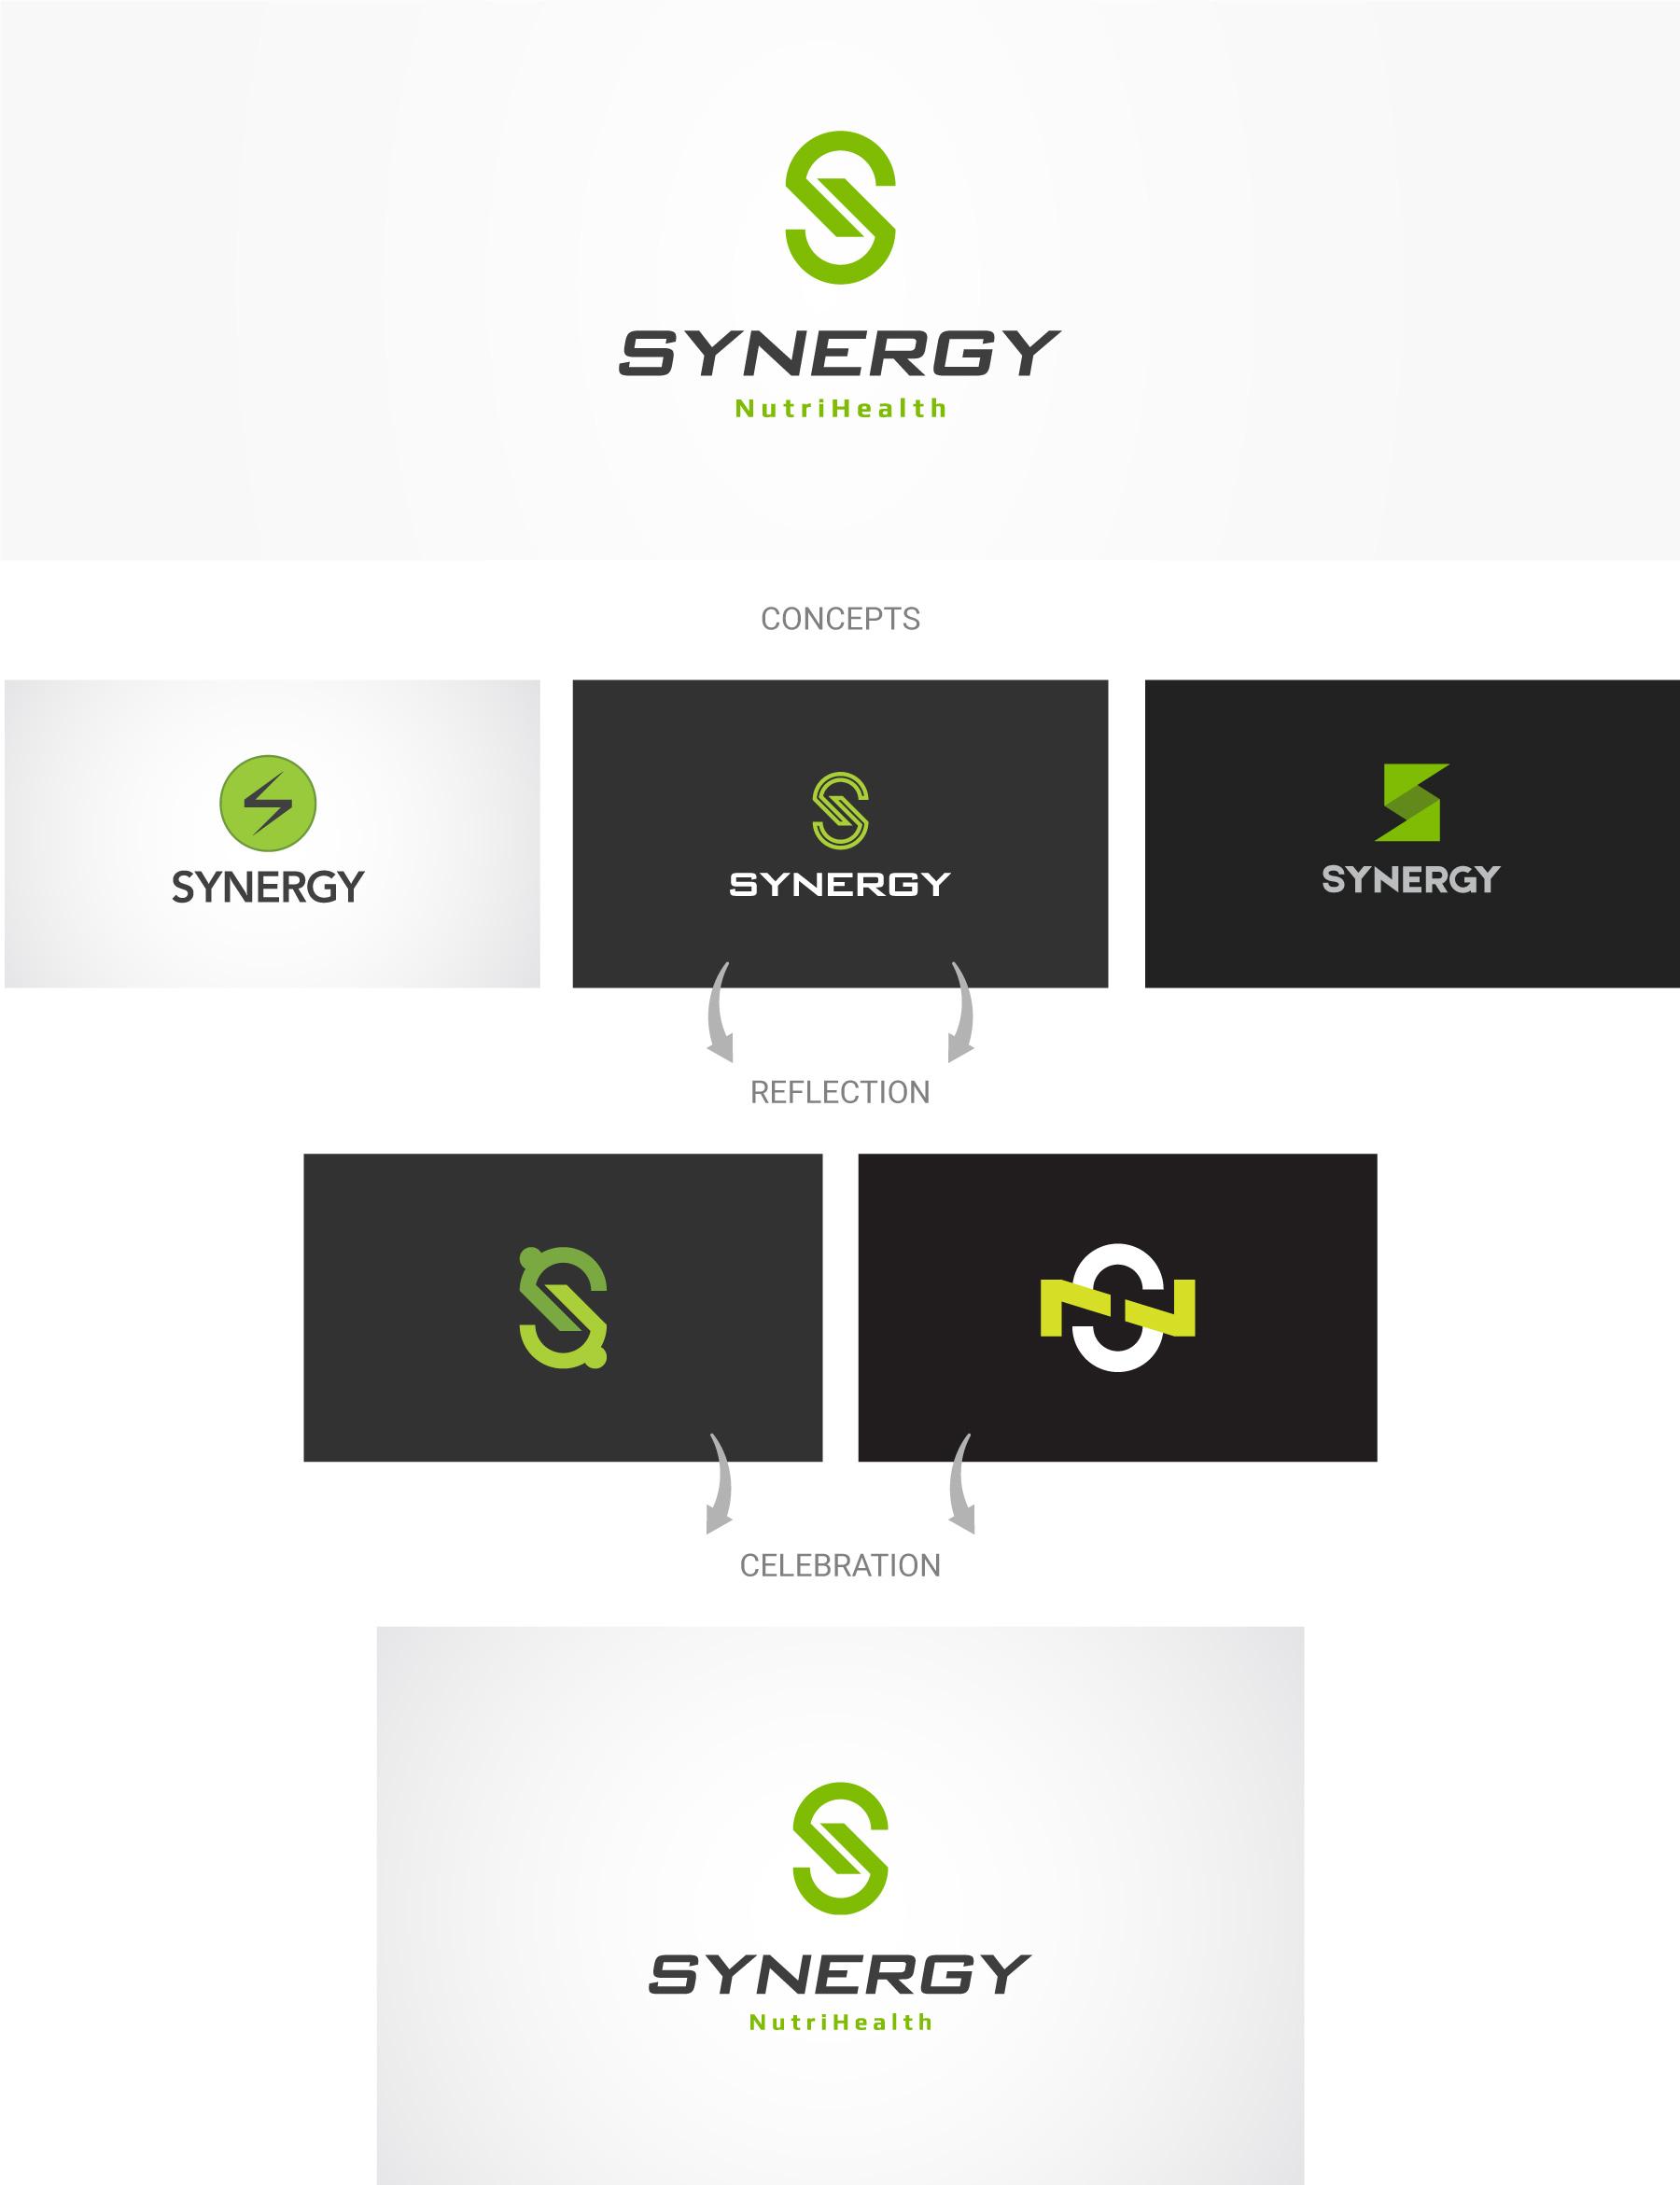 Synergy-nutri-health-logo-design